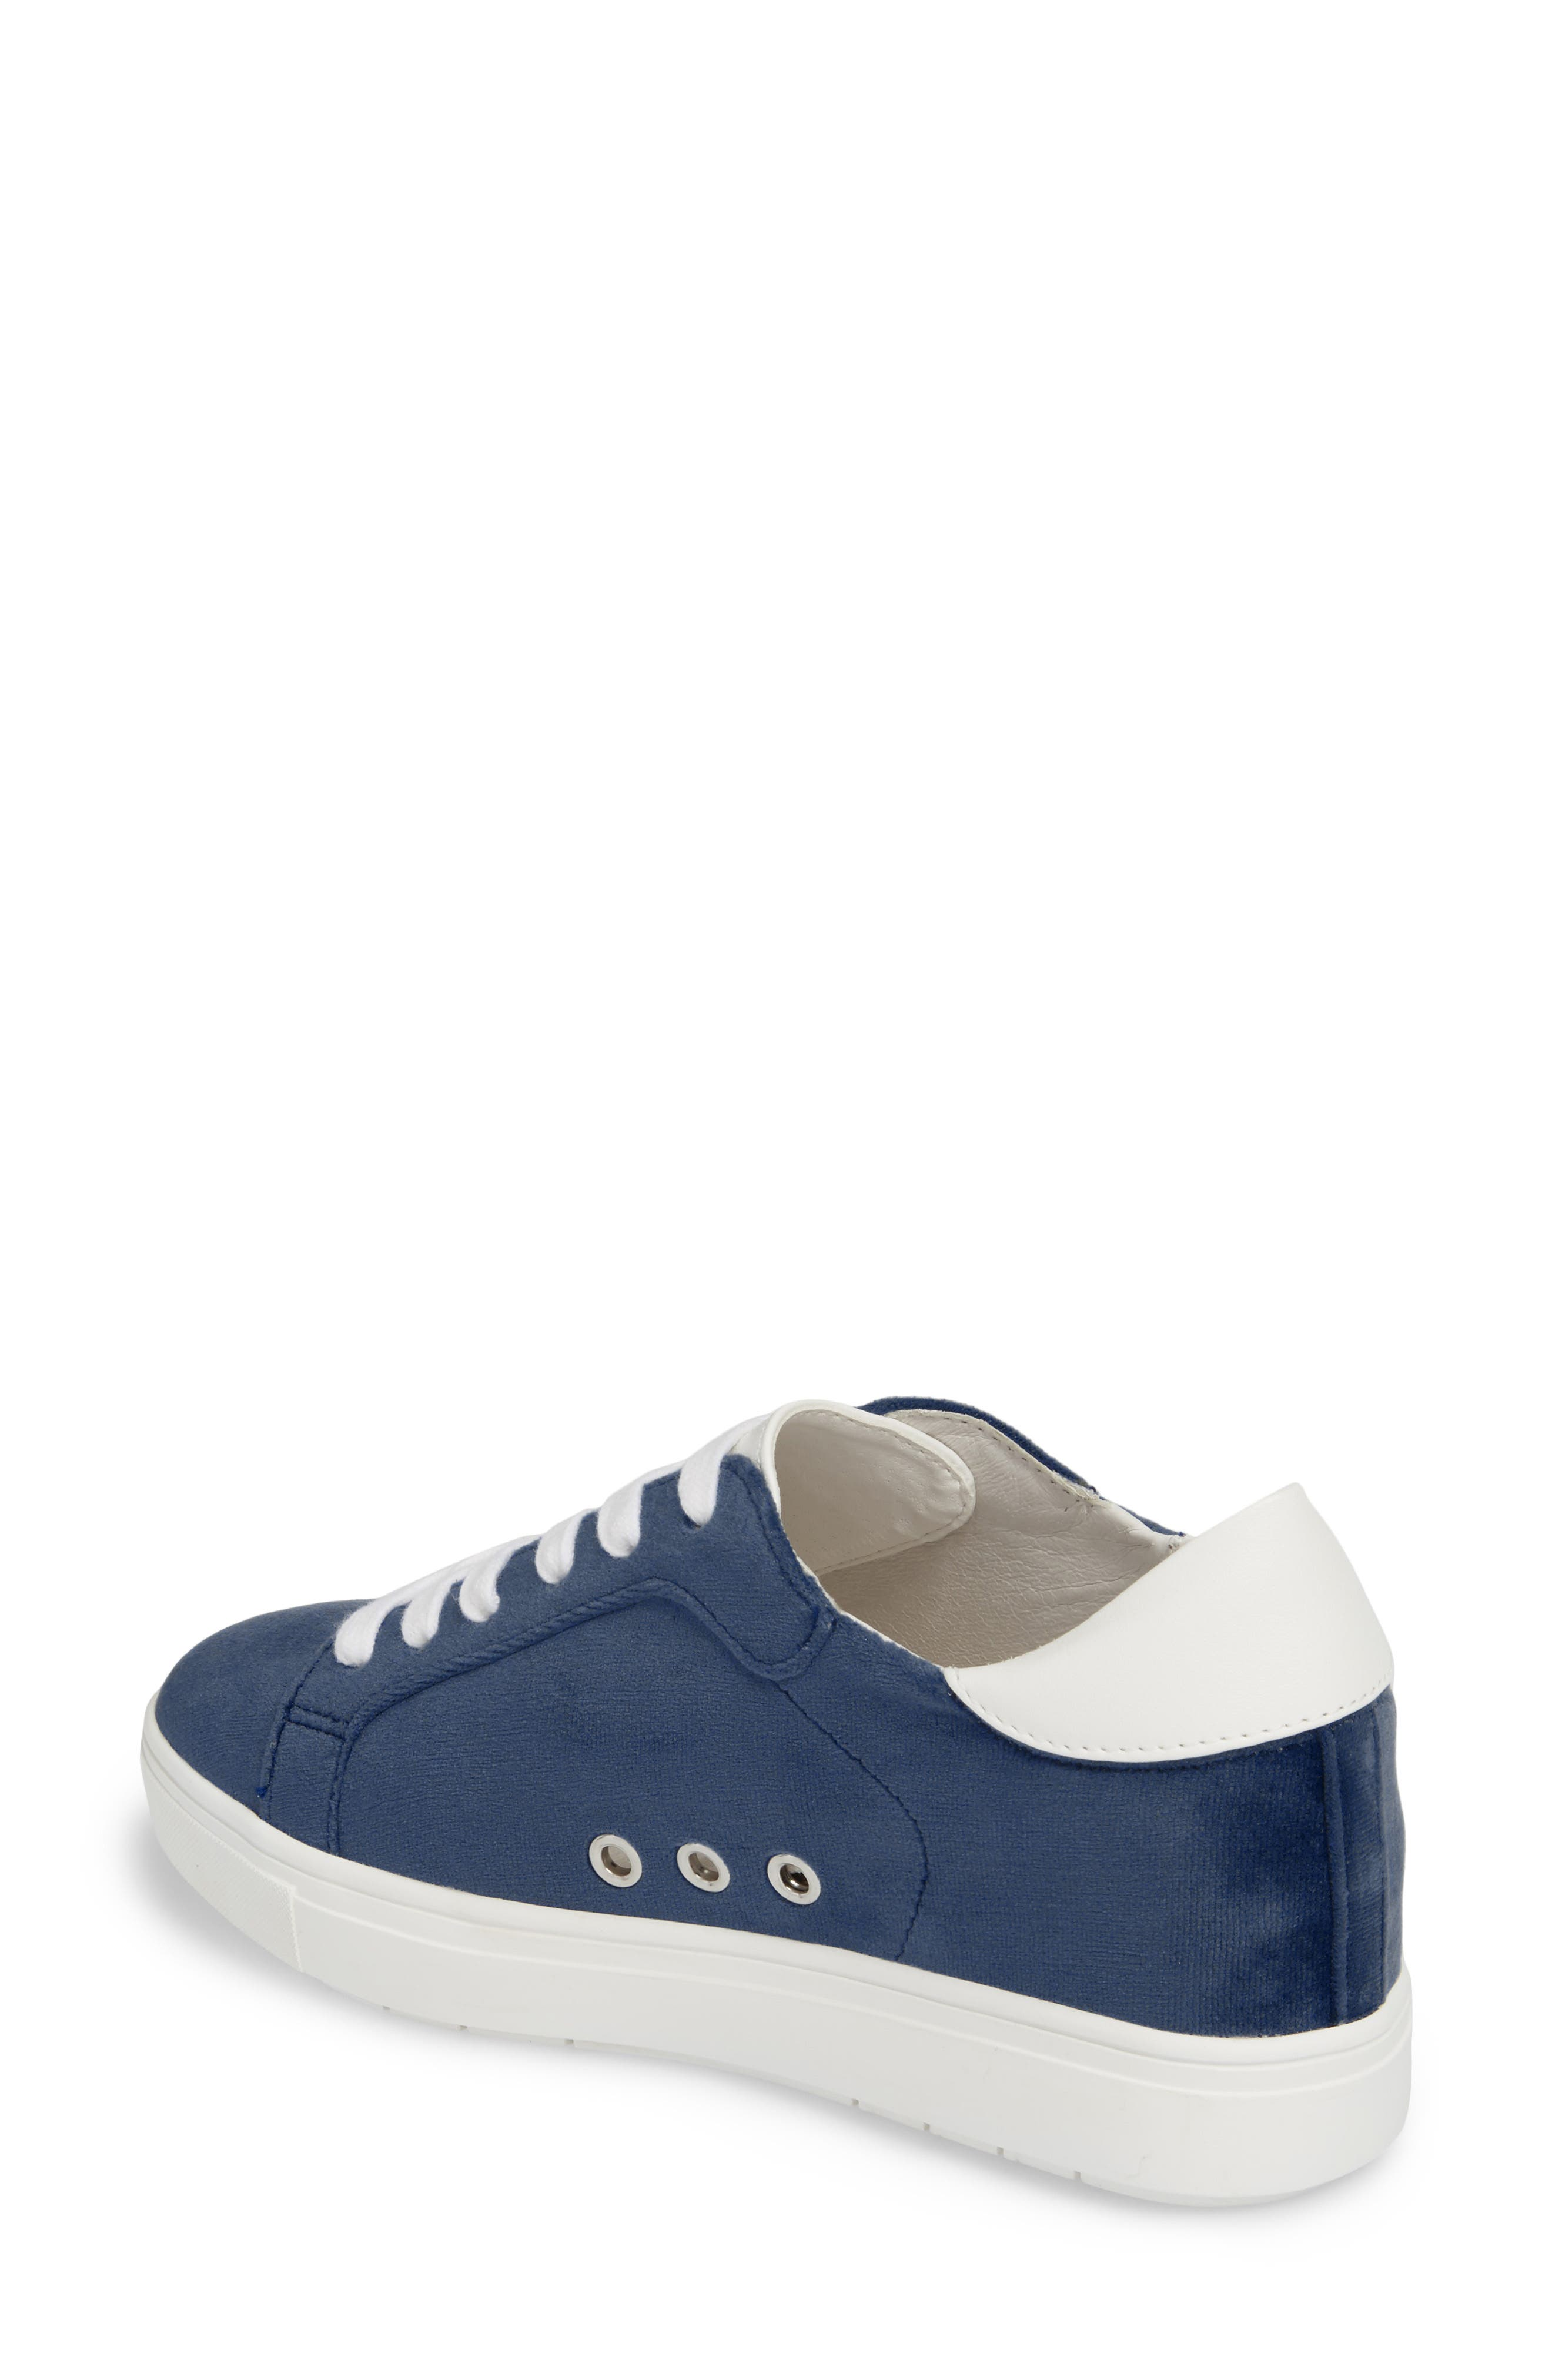 Alternate Image 2  - Steve Madden Steal Concealed Wedge Sneaker (Women)